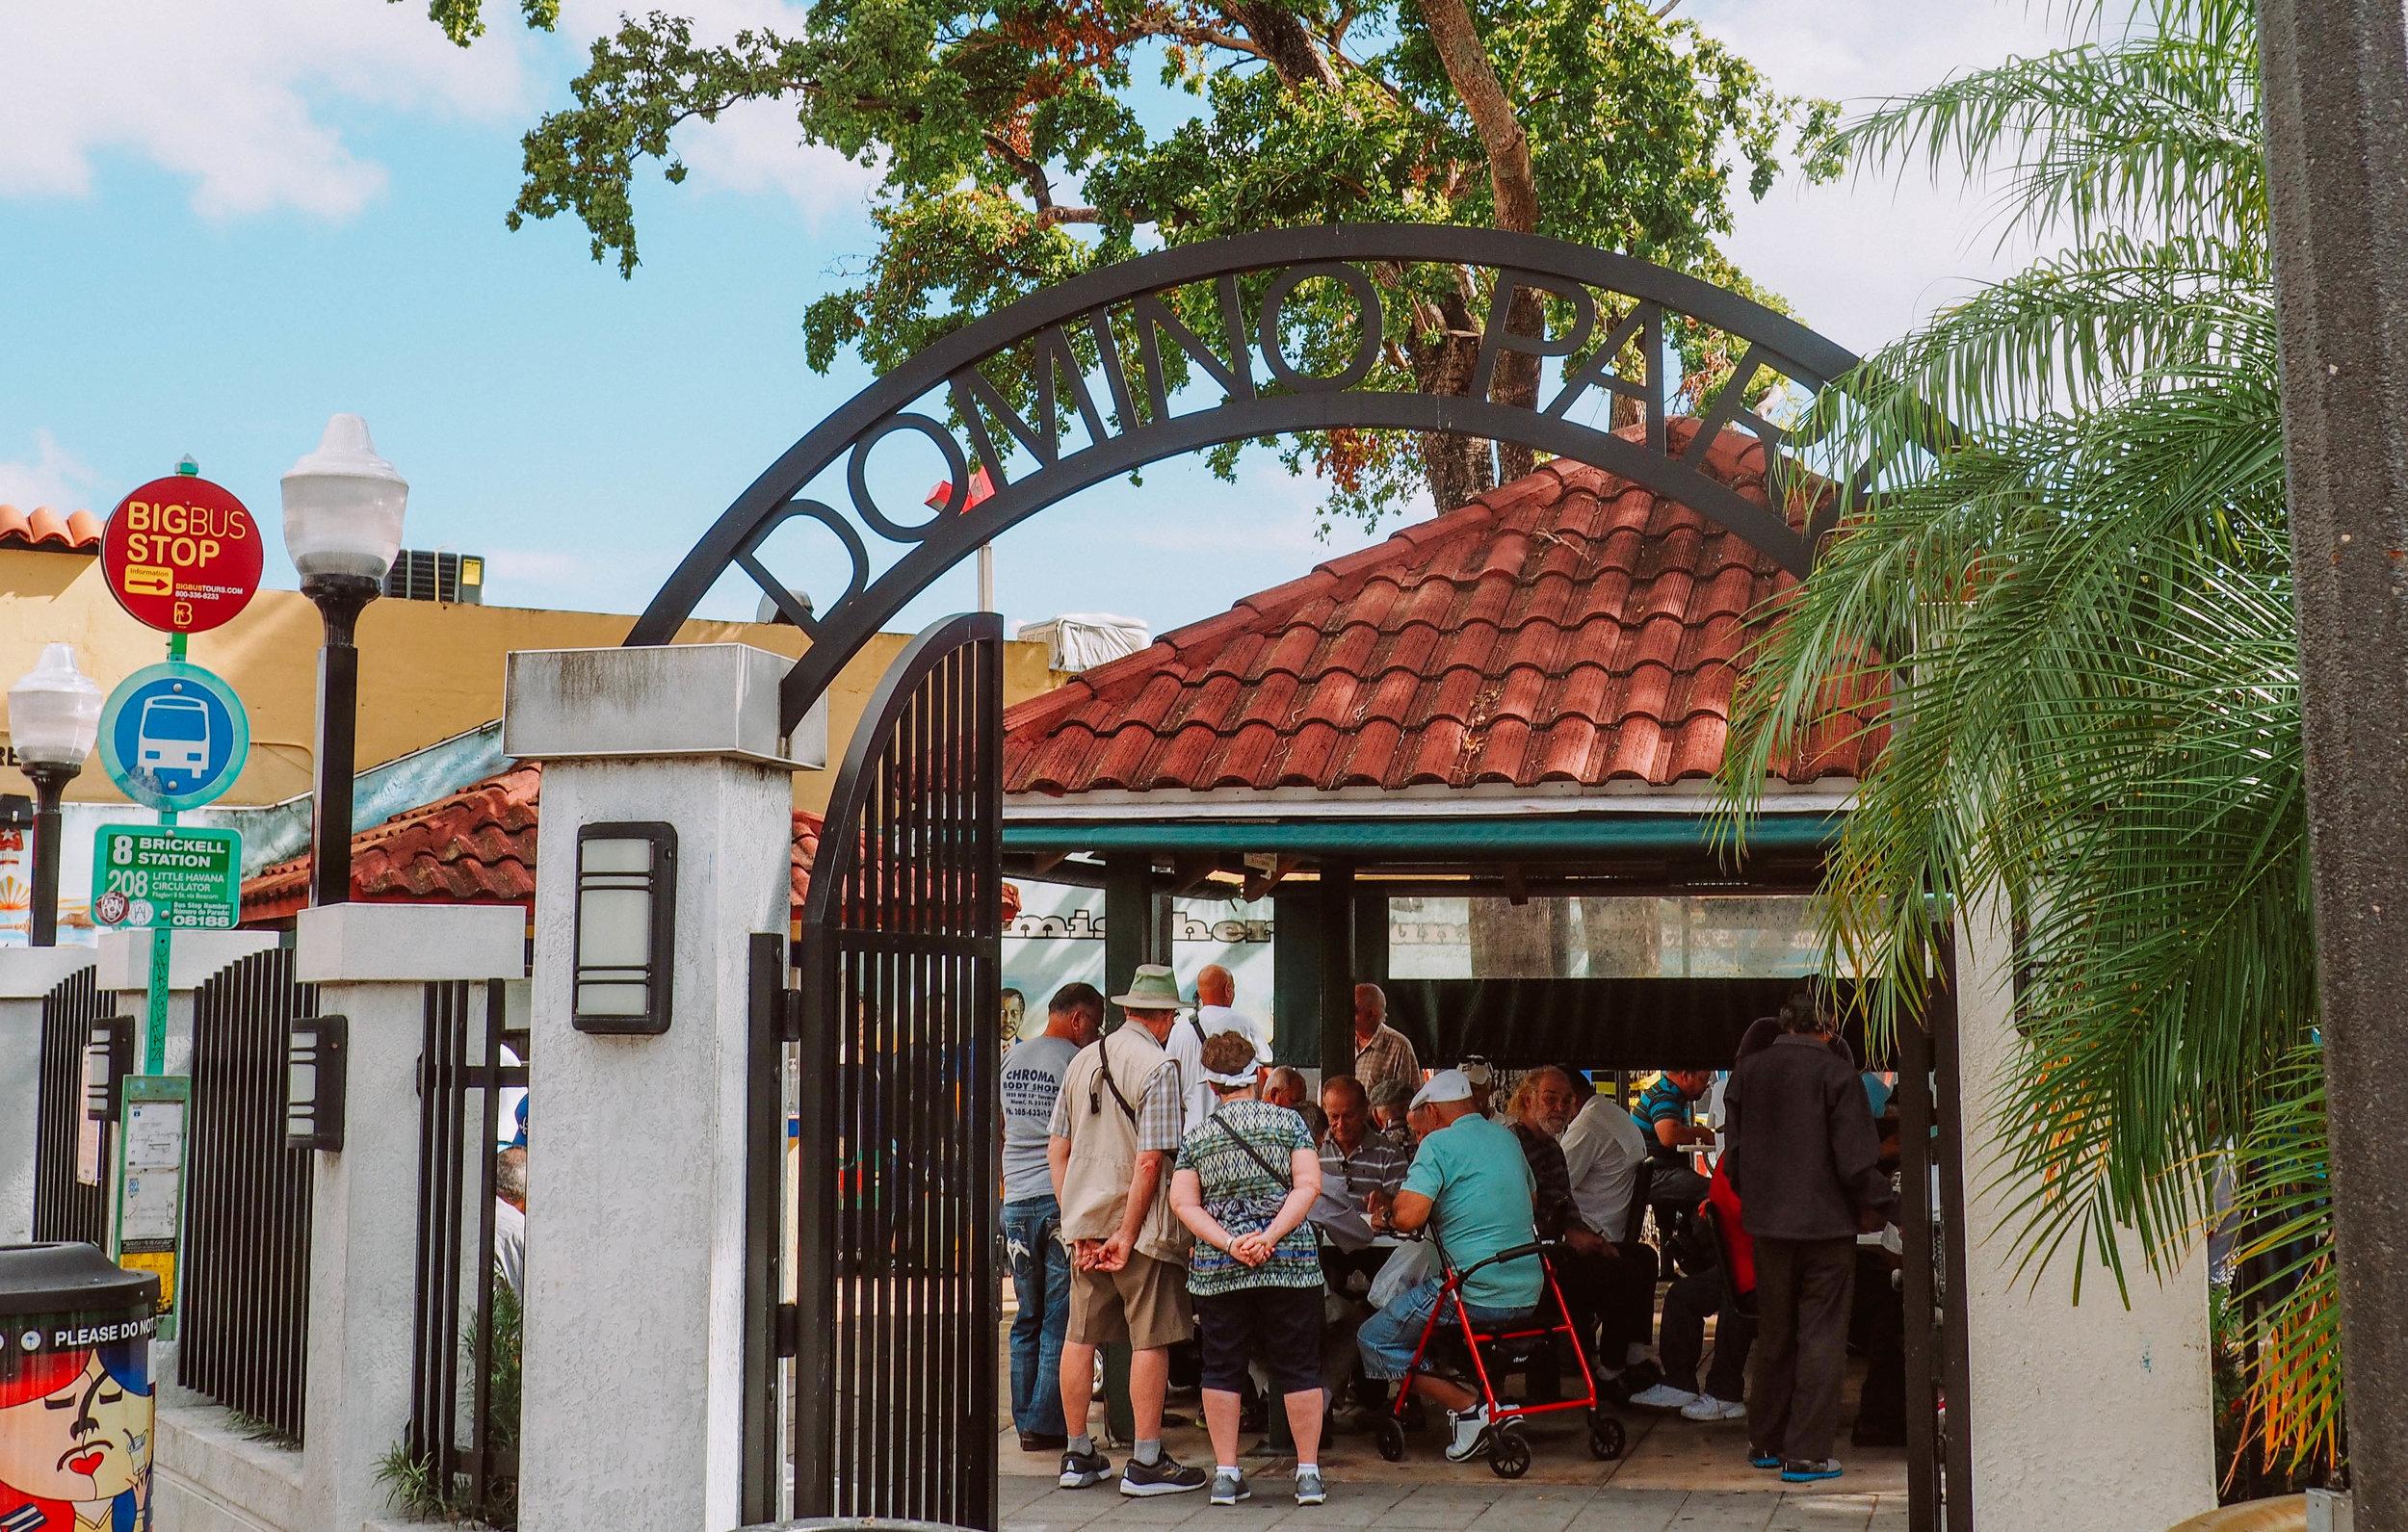 Locals and tourists at Domino Park, Little Havana, Miami, FL.